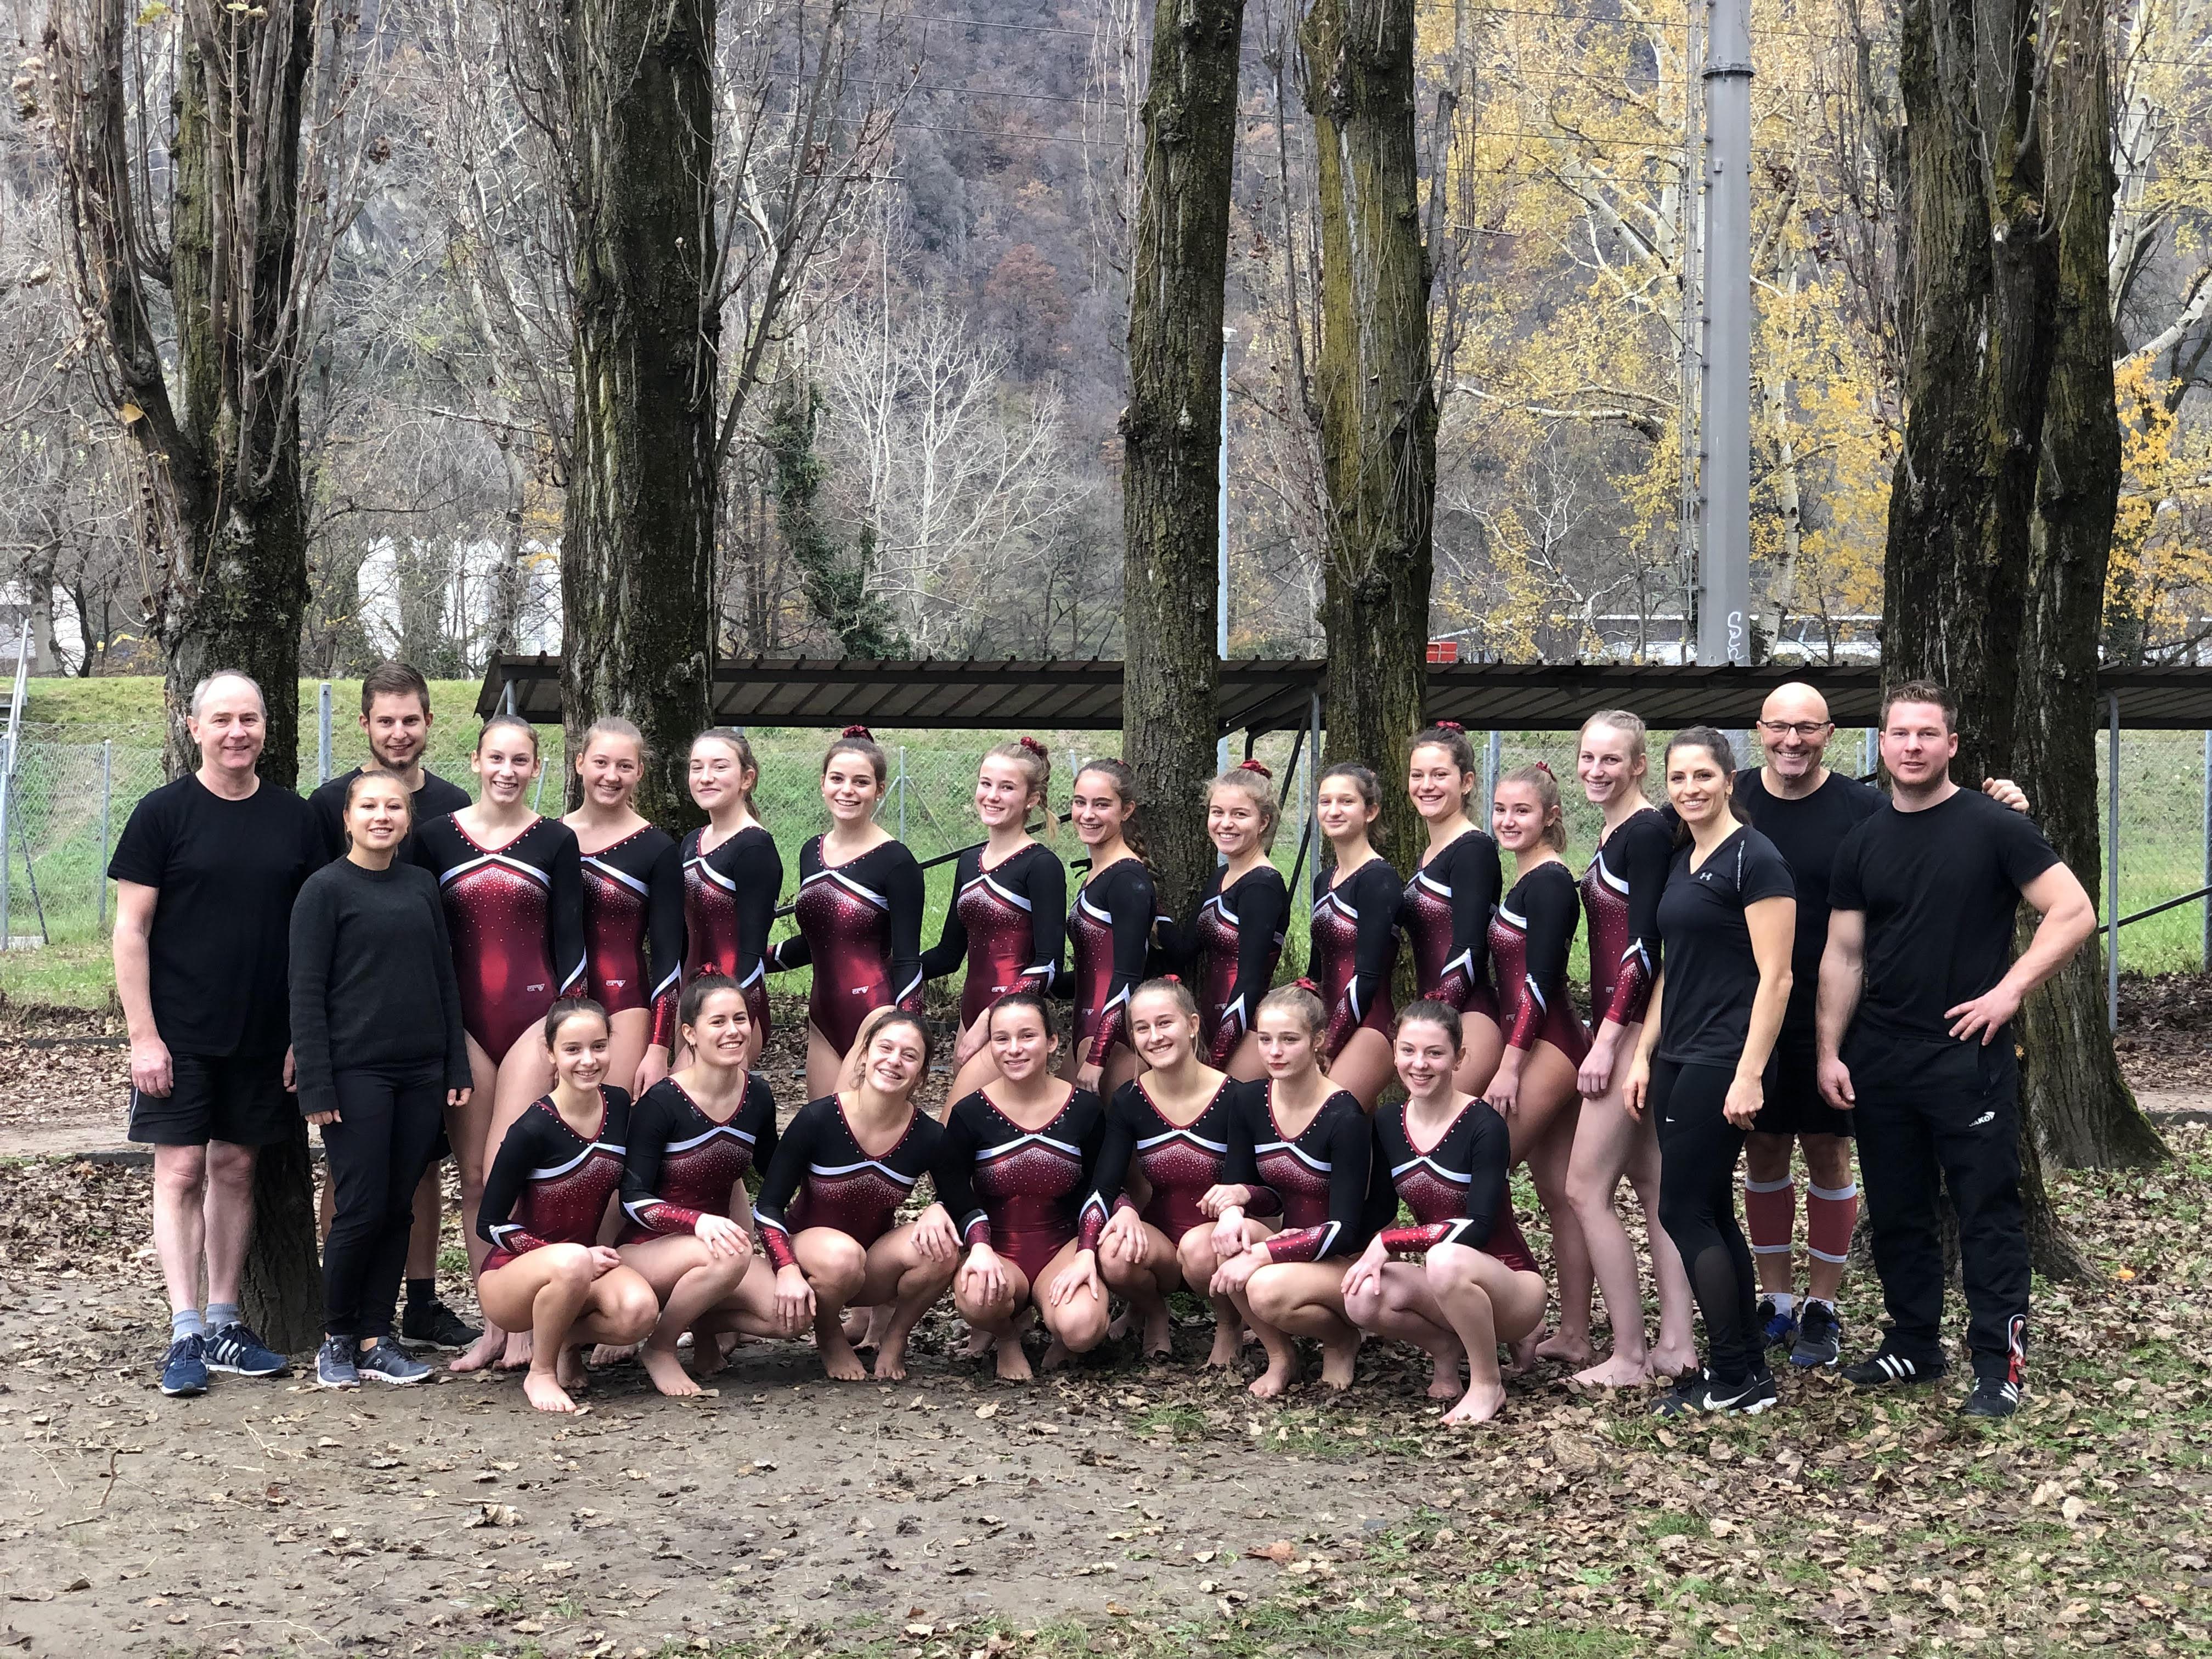 Schweizermeisterschaft in Bellinzona